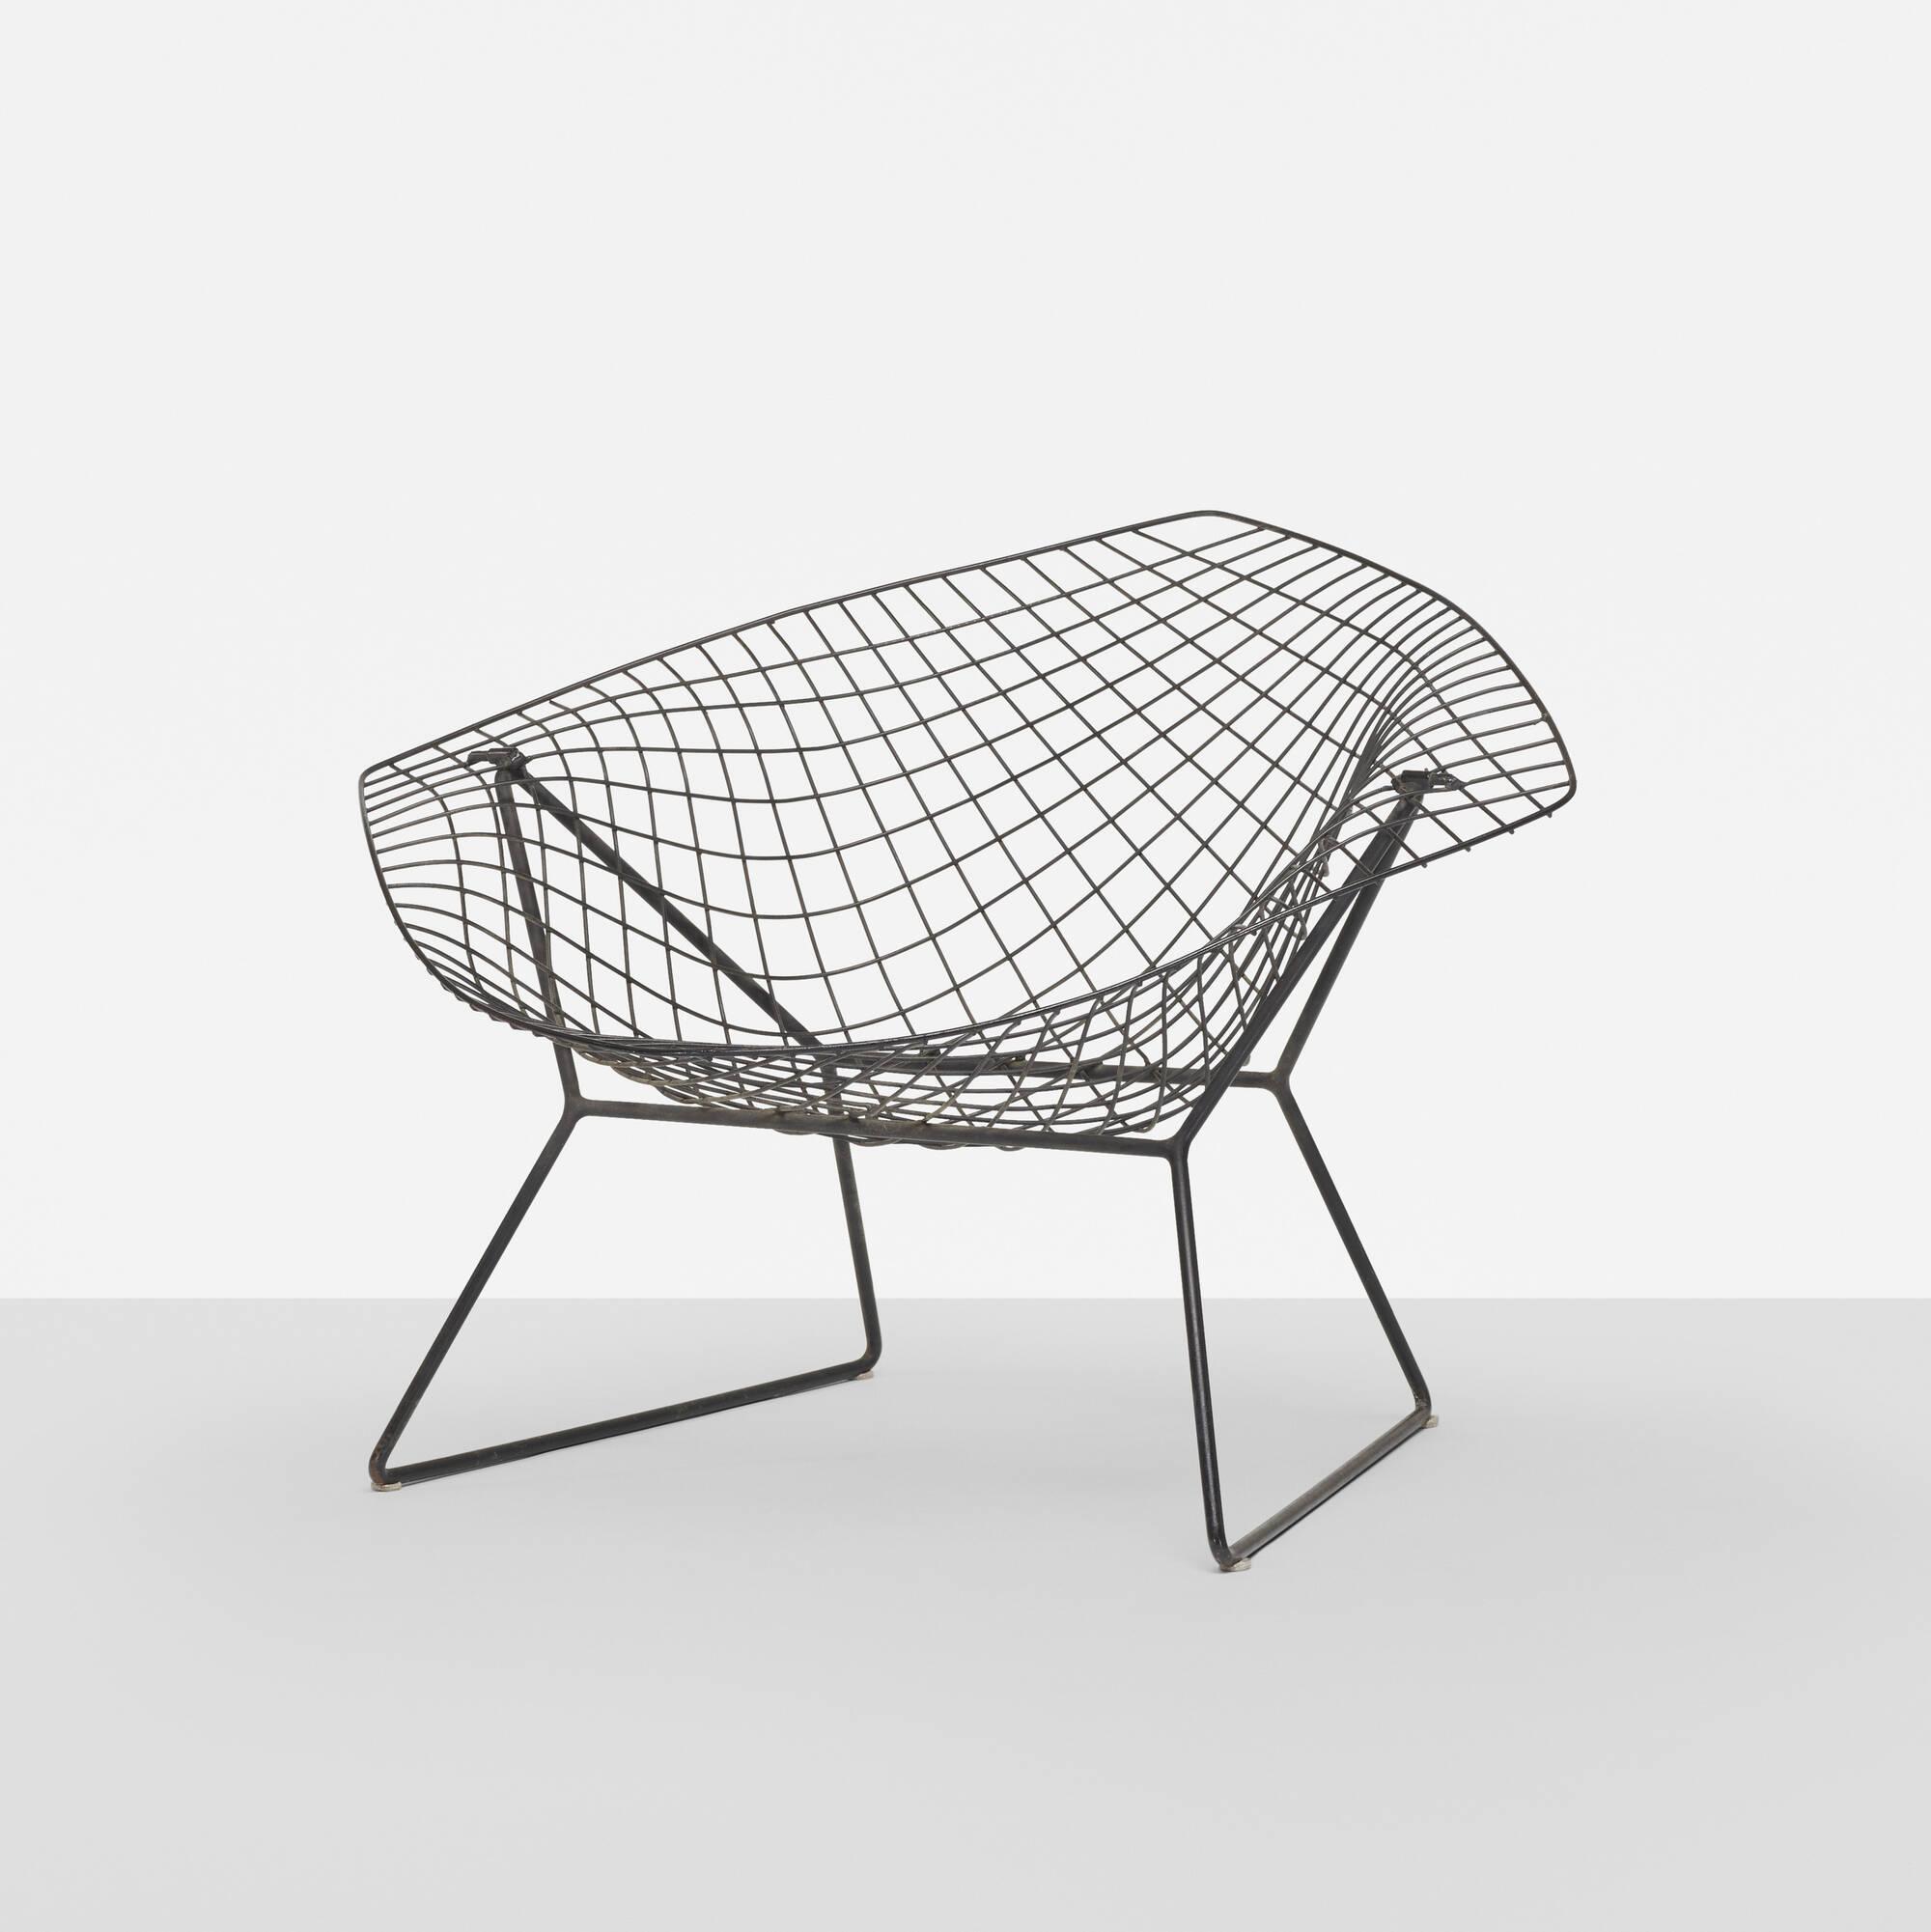 139: HARRY BERTOIA, prototype Diamond chair < Design, 24 March 2016 ...